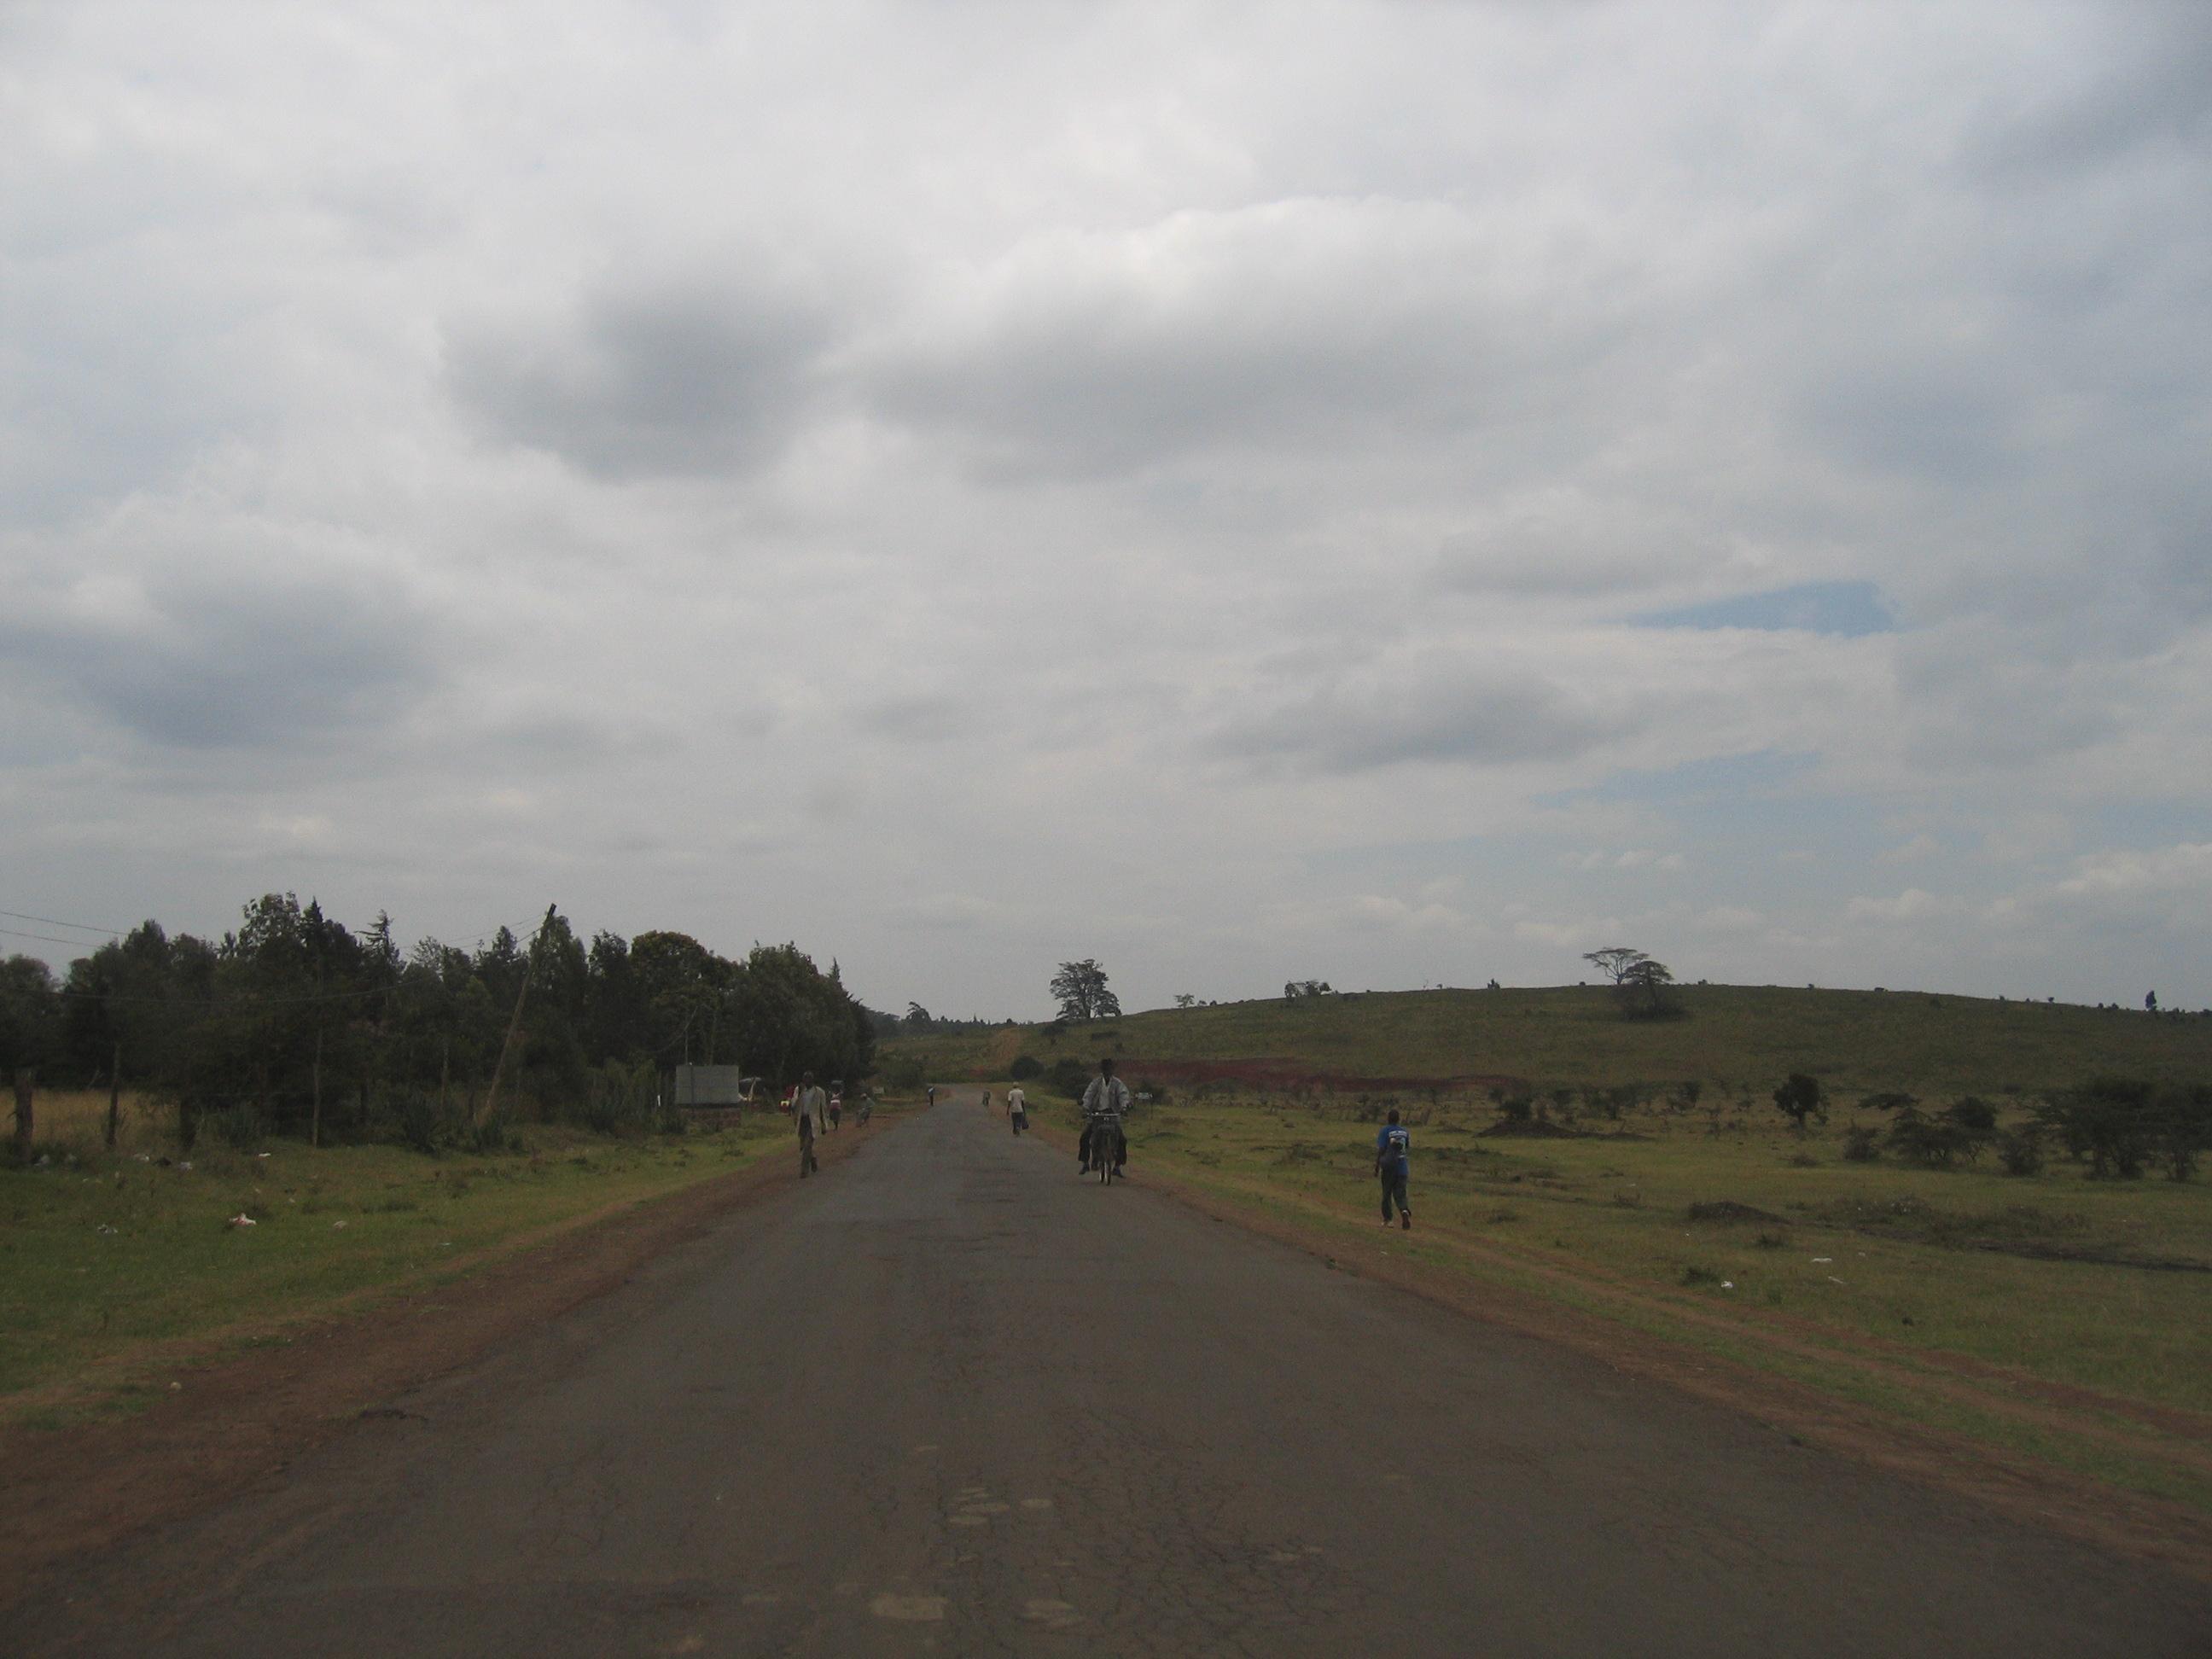 kenya_riftvalley_from_nairobi_06